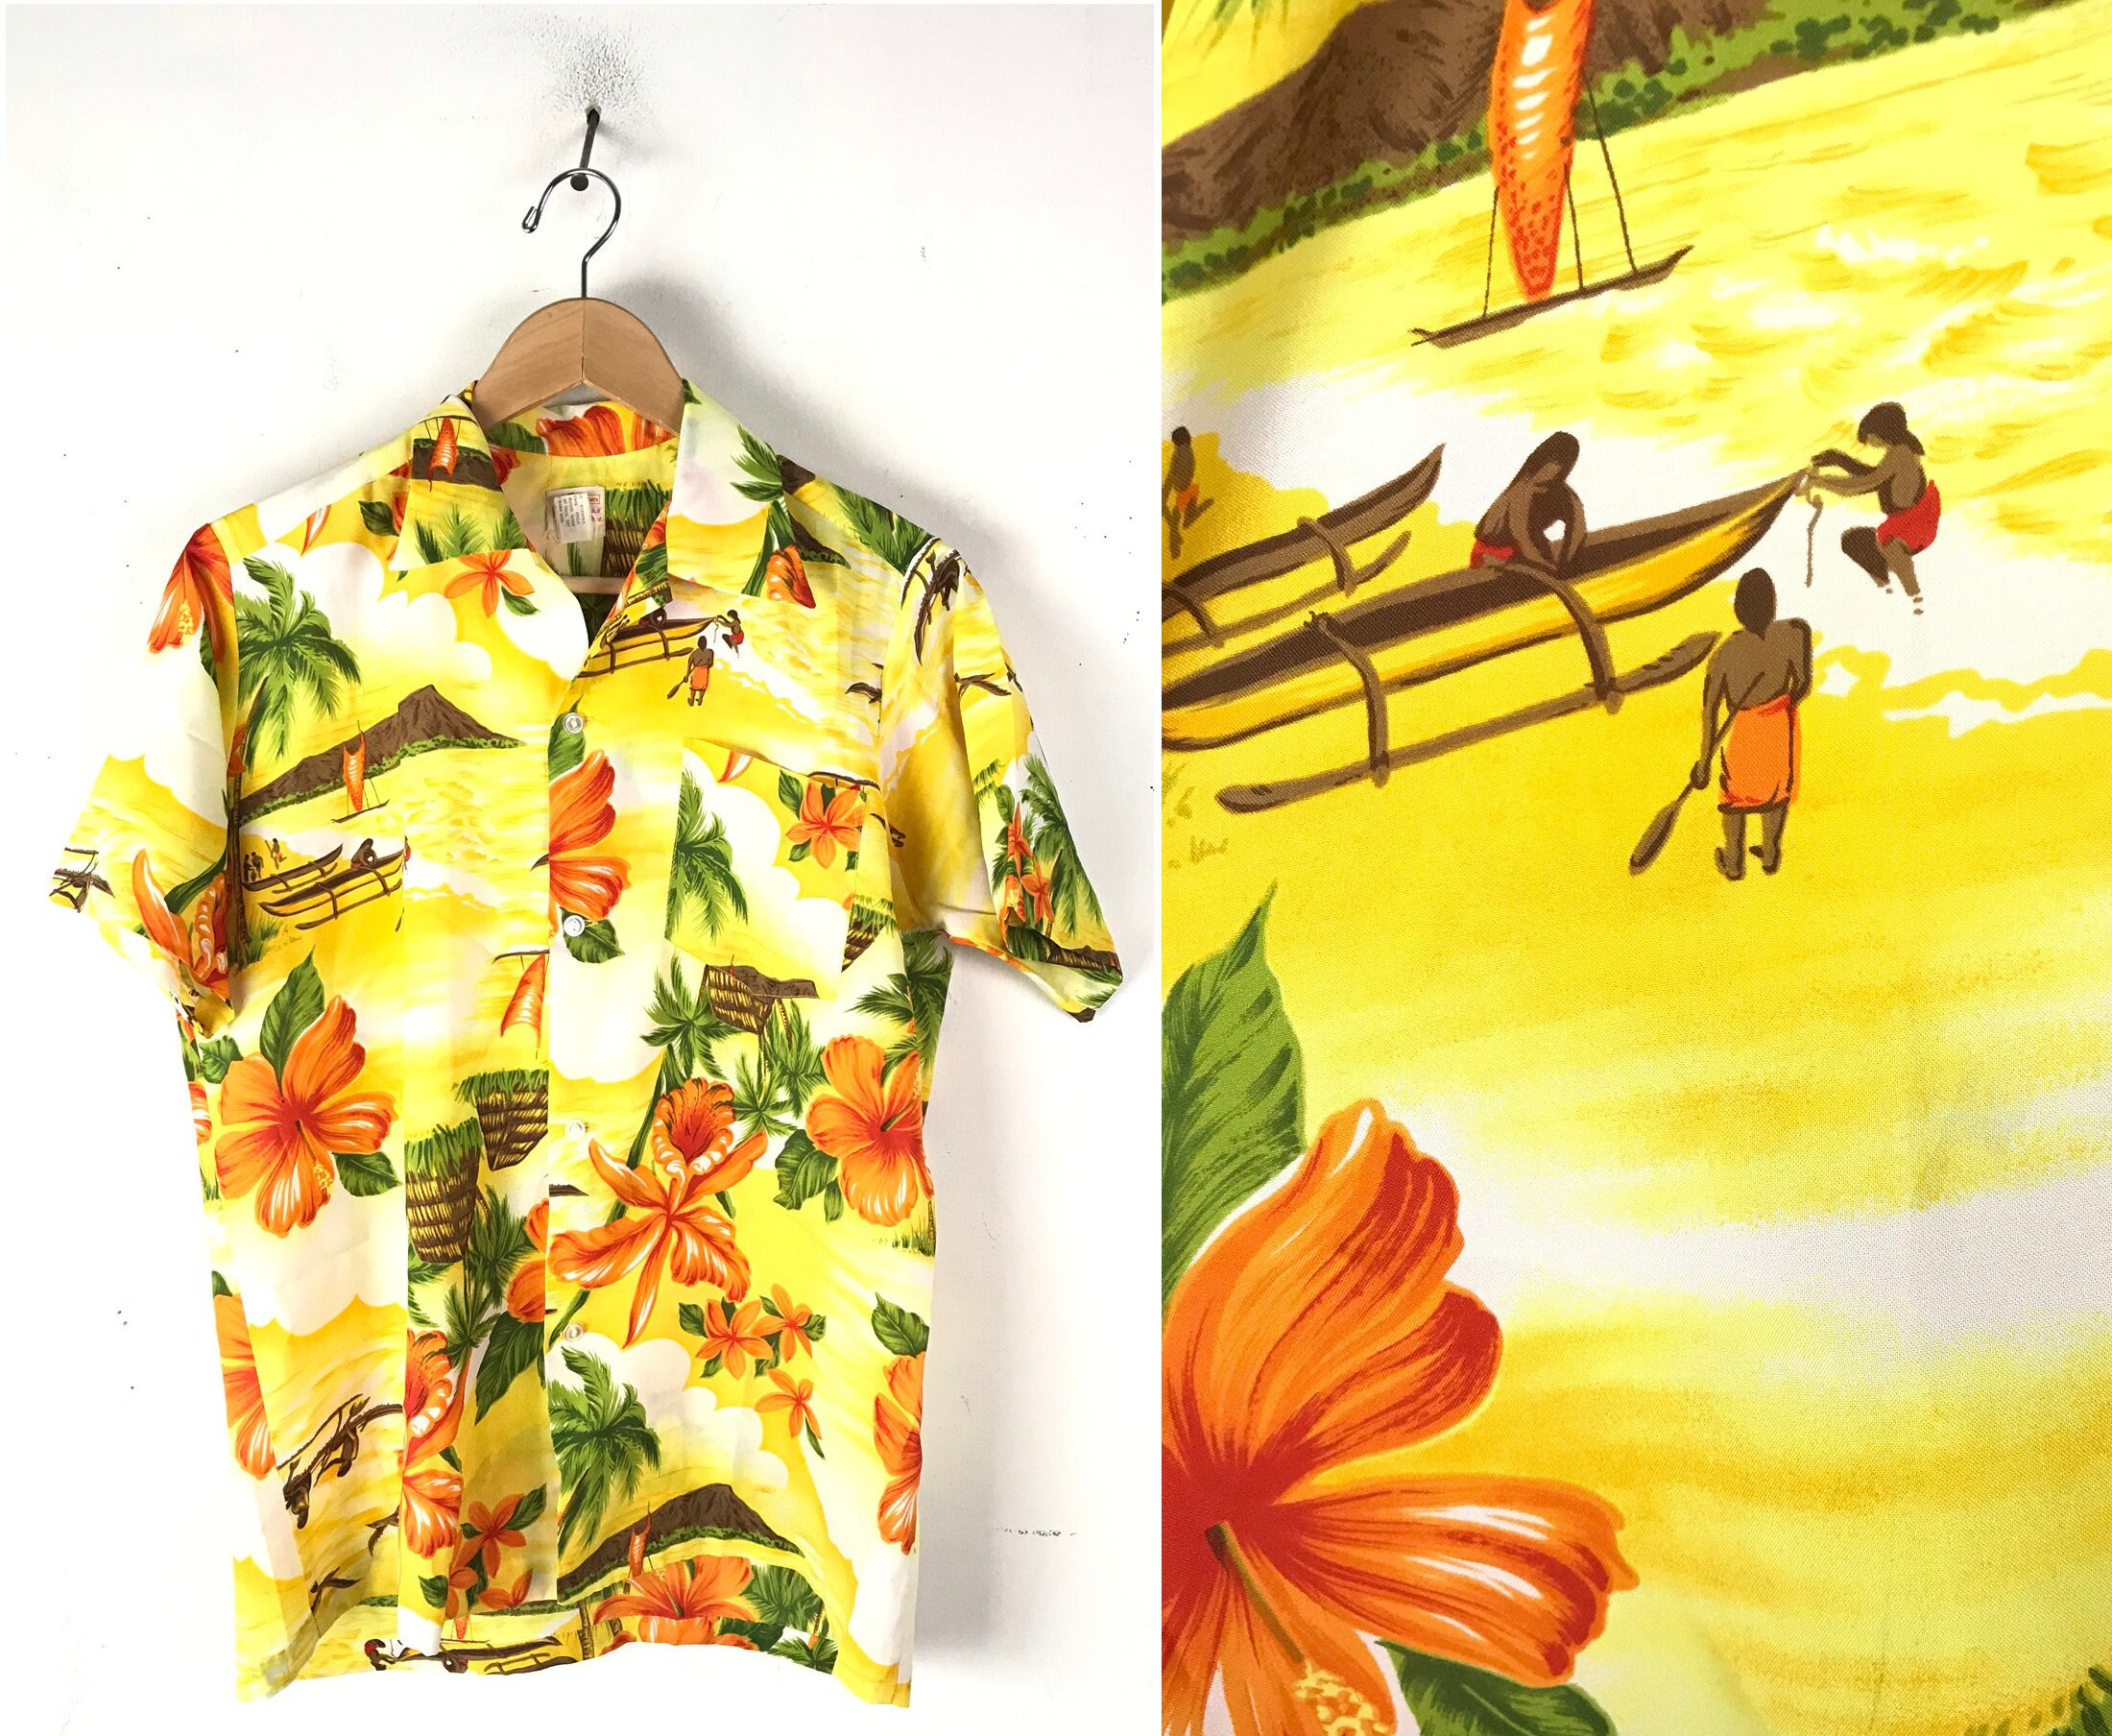 1970s Men's Shirt Styles – Vintage 70s Shirts for Guys 70S Sears Floral Island Hawaiian Shirt Mens Size MediumLarge, Vintage Yellow Orange Tropical Beach Shirt, 1970S Bright $114.00 AT vintagedancer.com